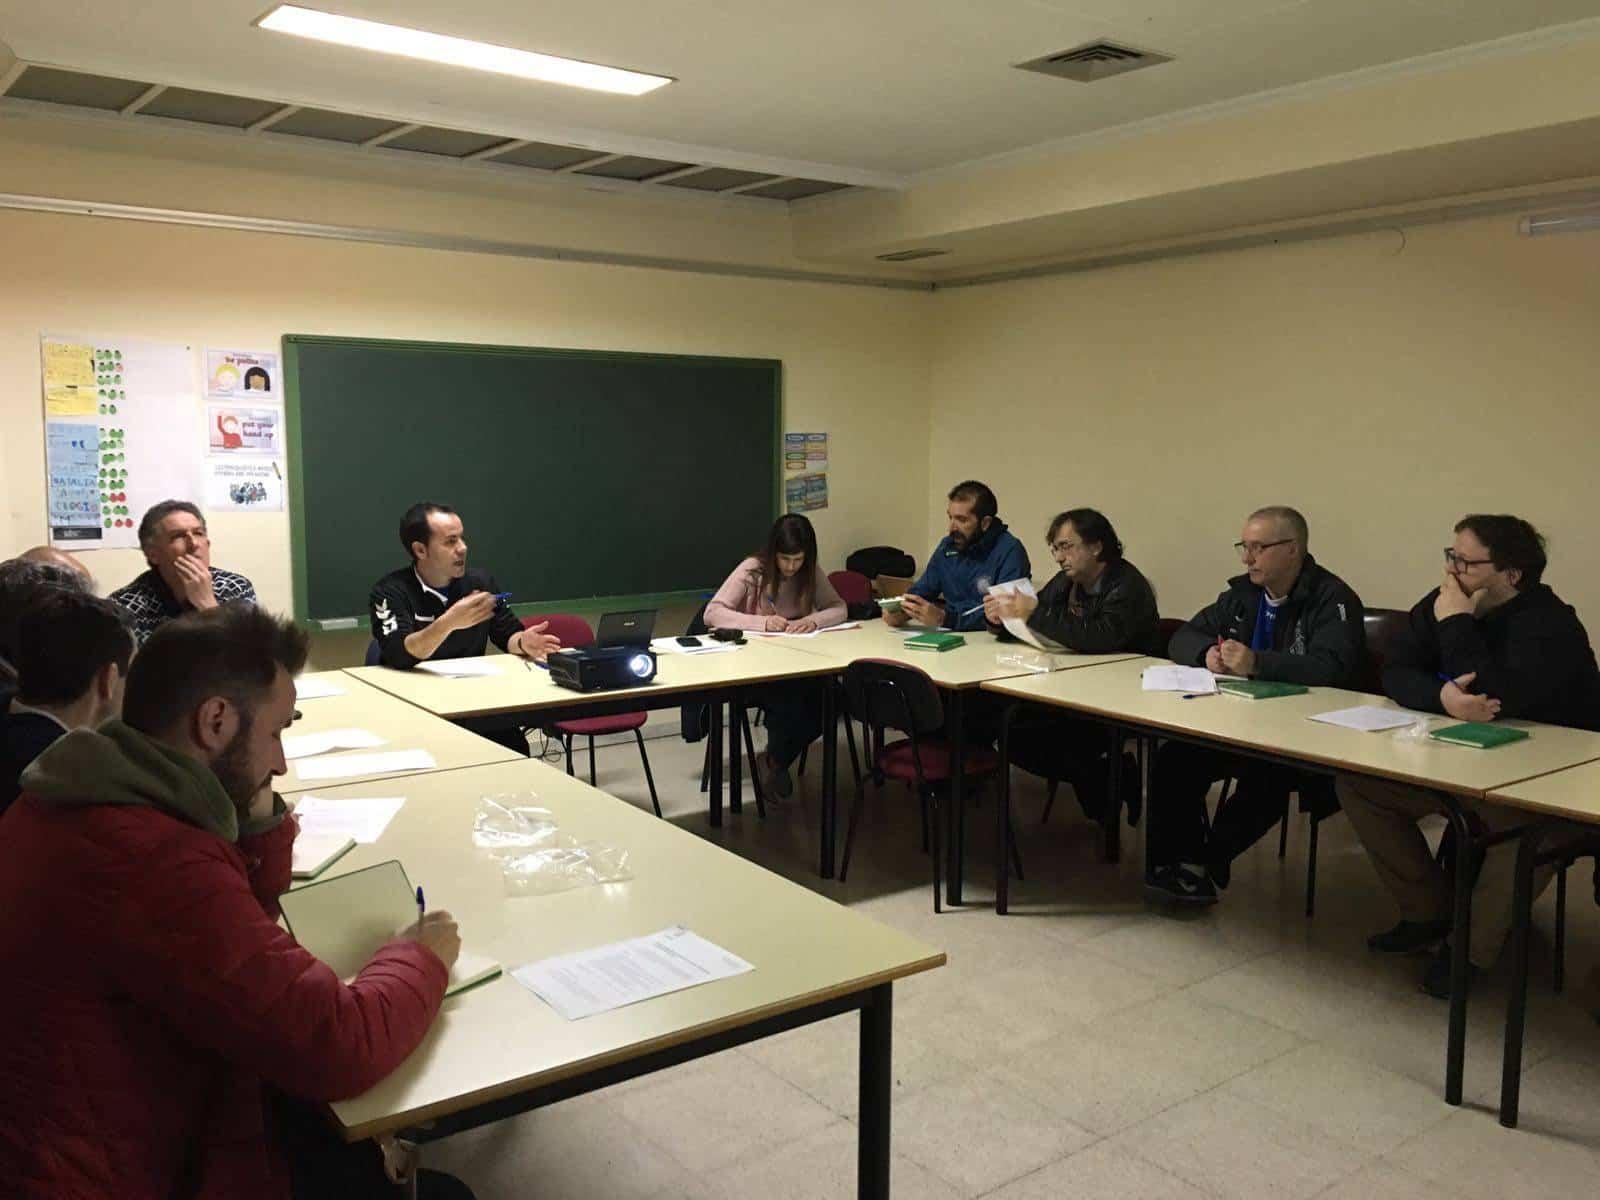 reunion consejo local deporte herencia 2 - Celebrado el Consejo Local del Deporte en Herencia